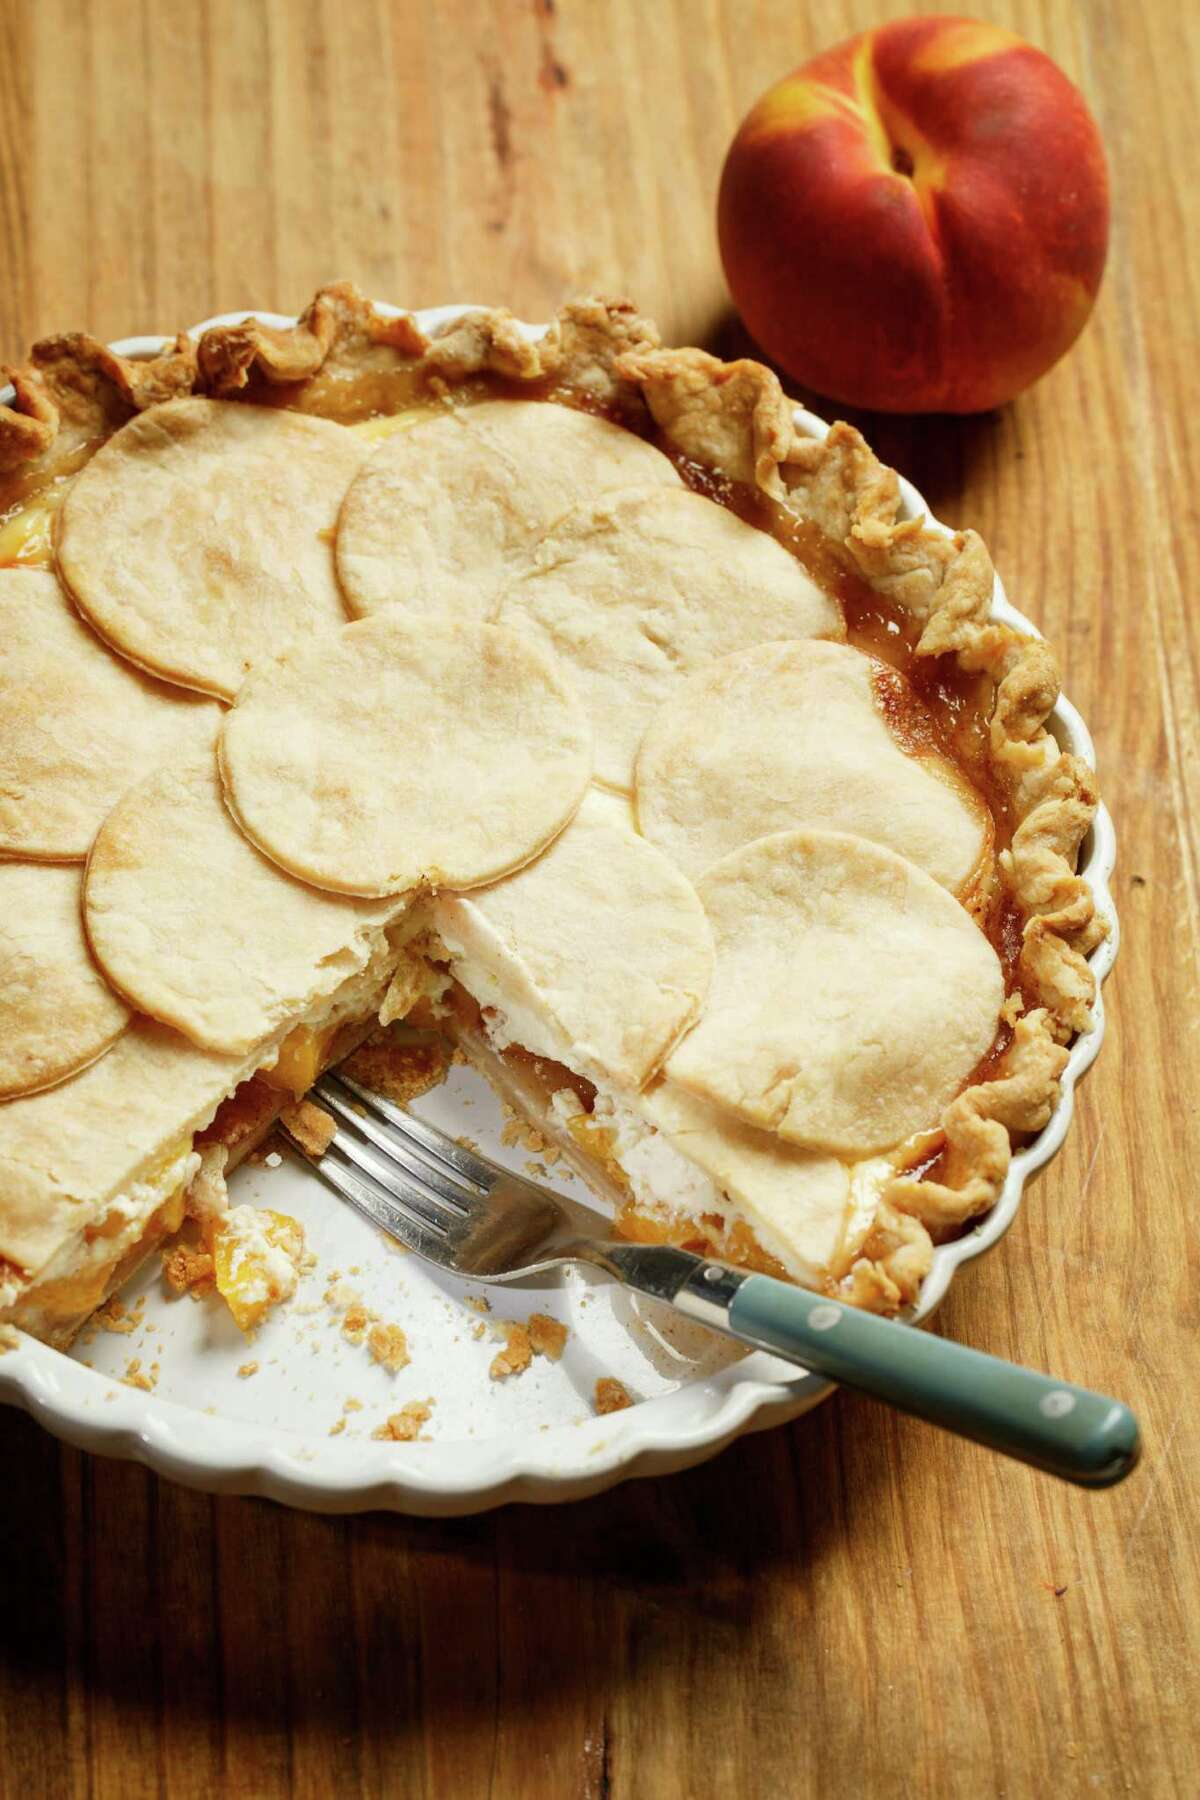 K2K. Kitchen to Kitchen. Peacheesy Pie, photographed in the Houston Chronicle Photo Studio, Thursday, Aug. 29, 2013, in Houston. ( Michael Paulsen / Houston Chronicle )